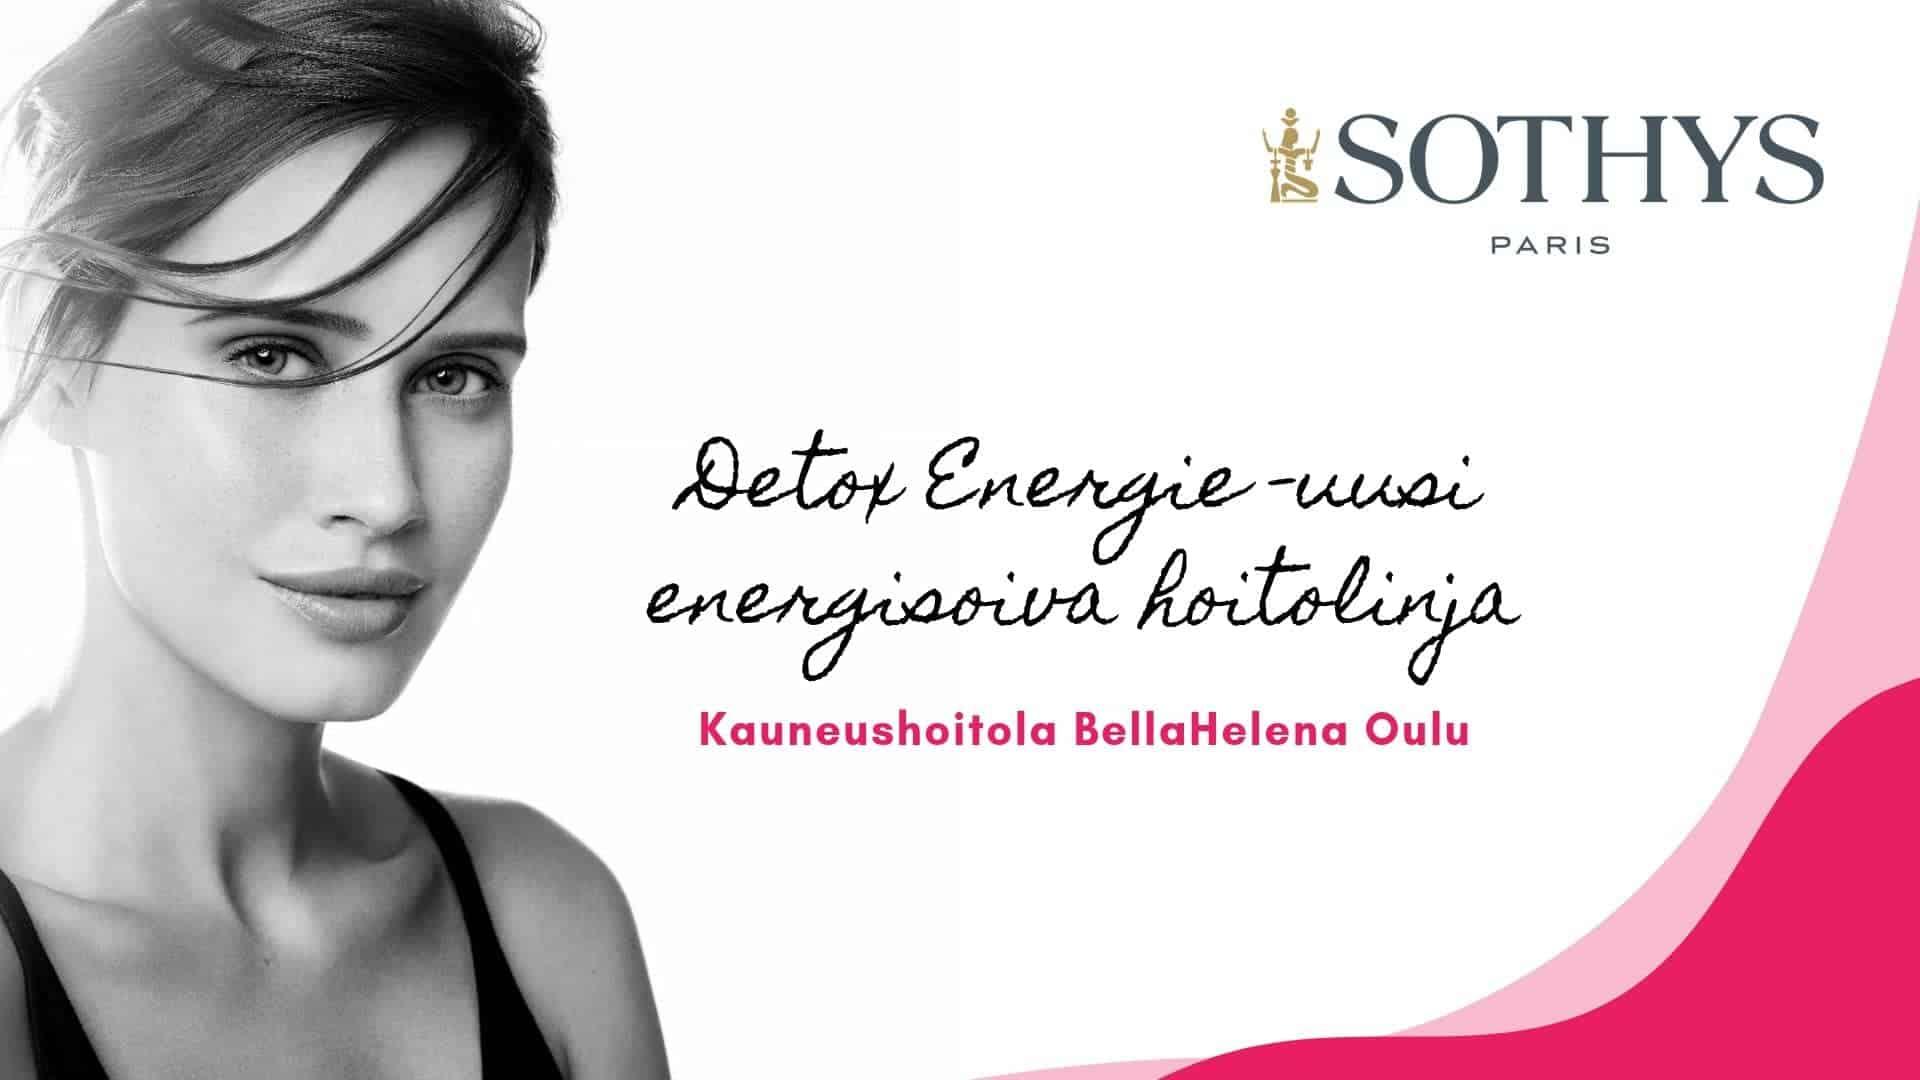 Sothys Detox Energie hoitonja uutuus energisoiva kasvohoito Kauneushoitola BellaHelena Oulu